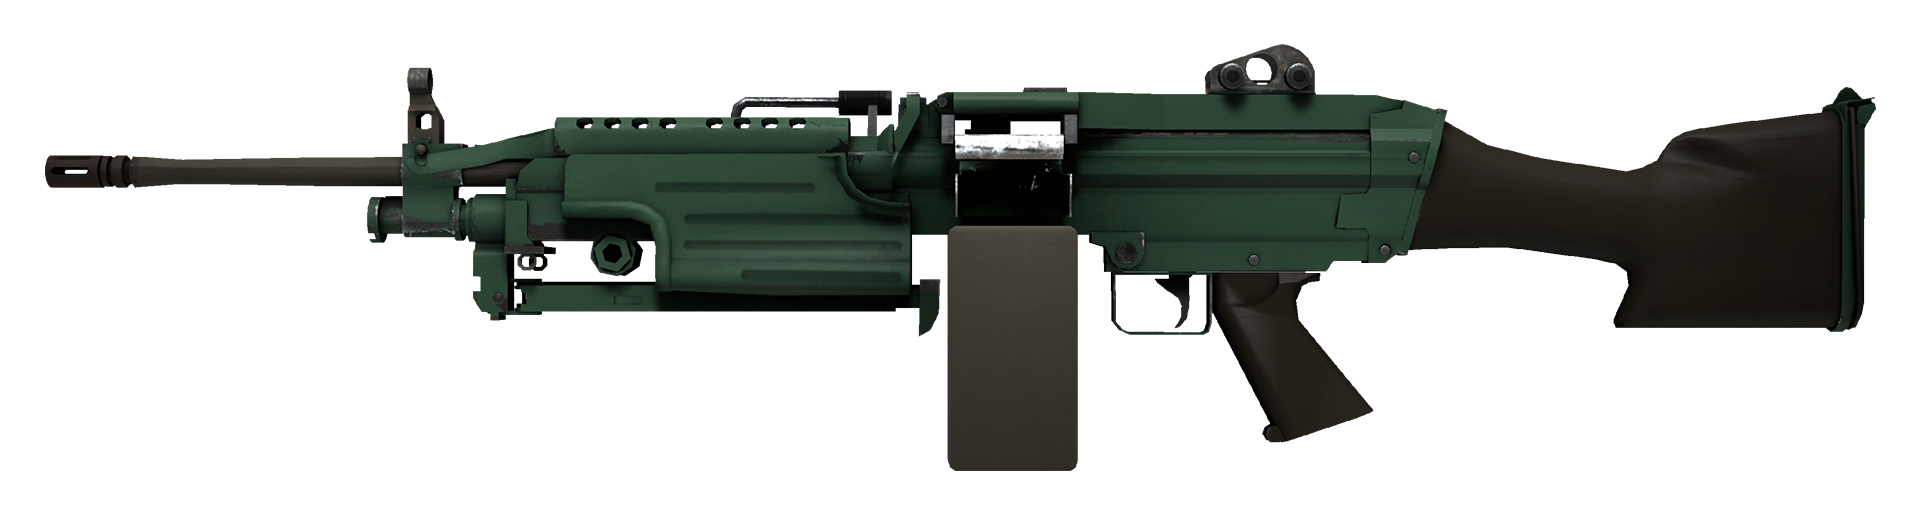 M249 Jungle Large Rendering